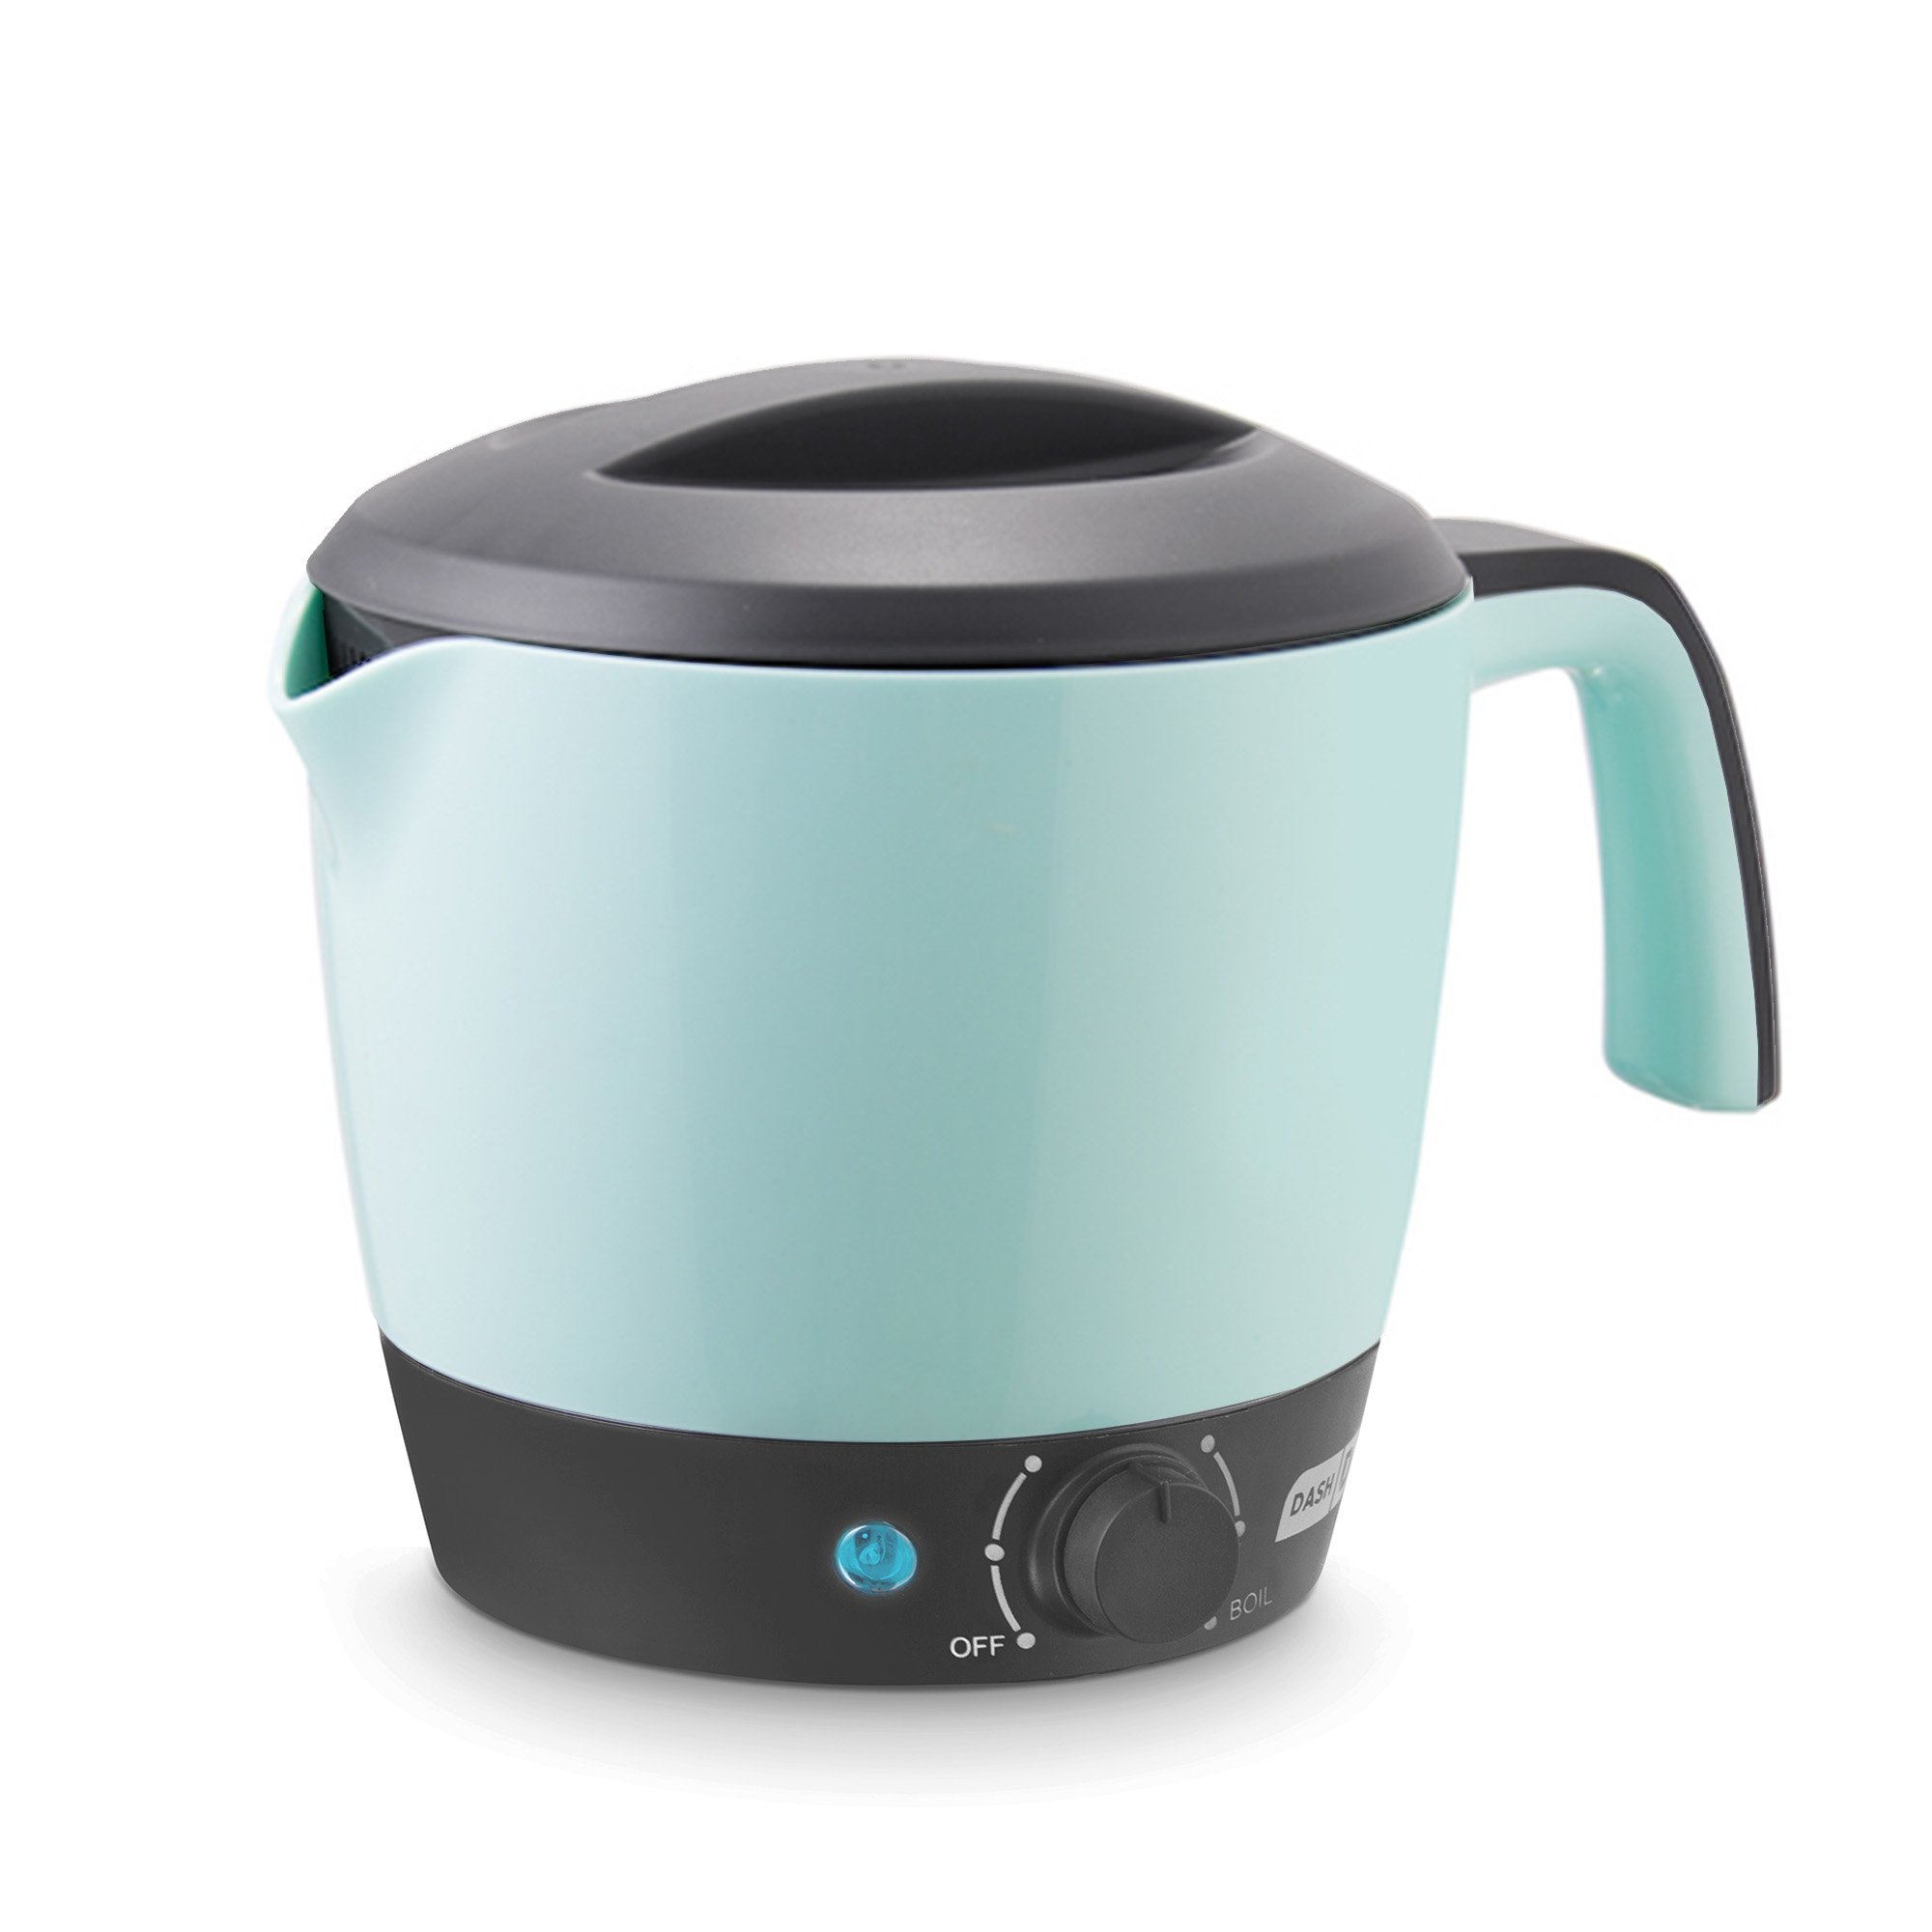 DASH DMC100AQ Express Electric Cooker Hot Pot with Temperature Control for Noodles, Rice, Pasta, Soups, Boiling Water and More, 1.2 L, Aqua